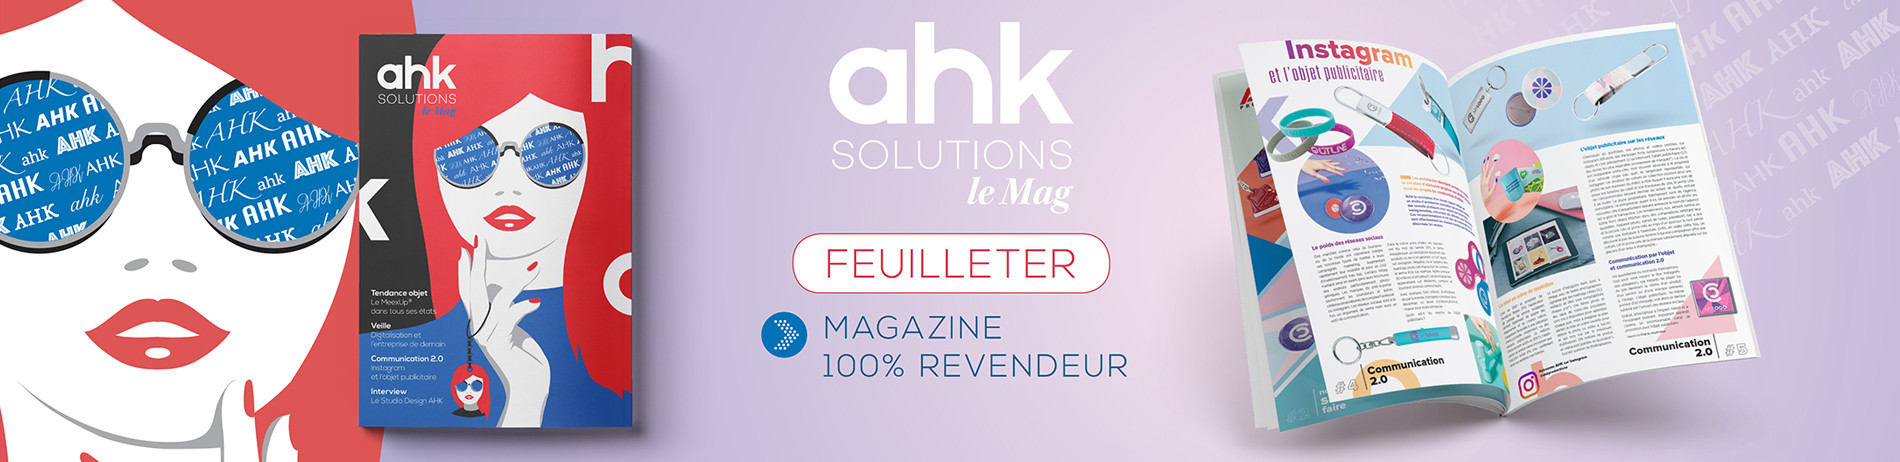 AHK Solutions le Mag - Magazine 100% revendeur